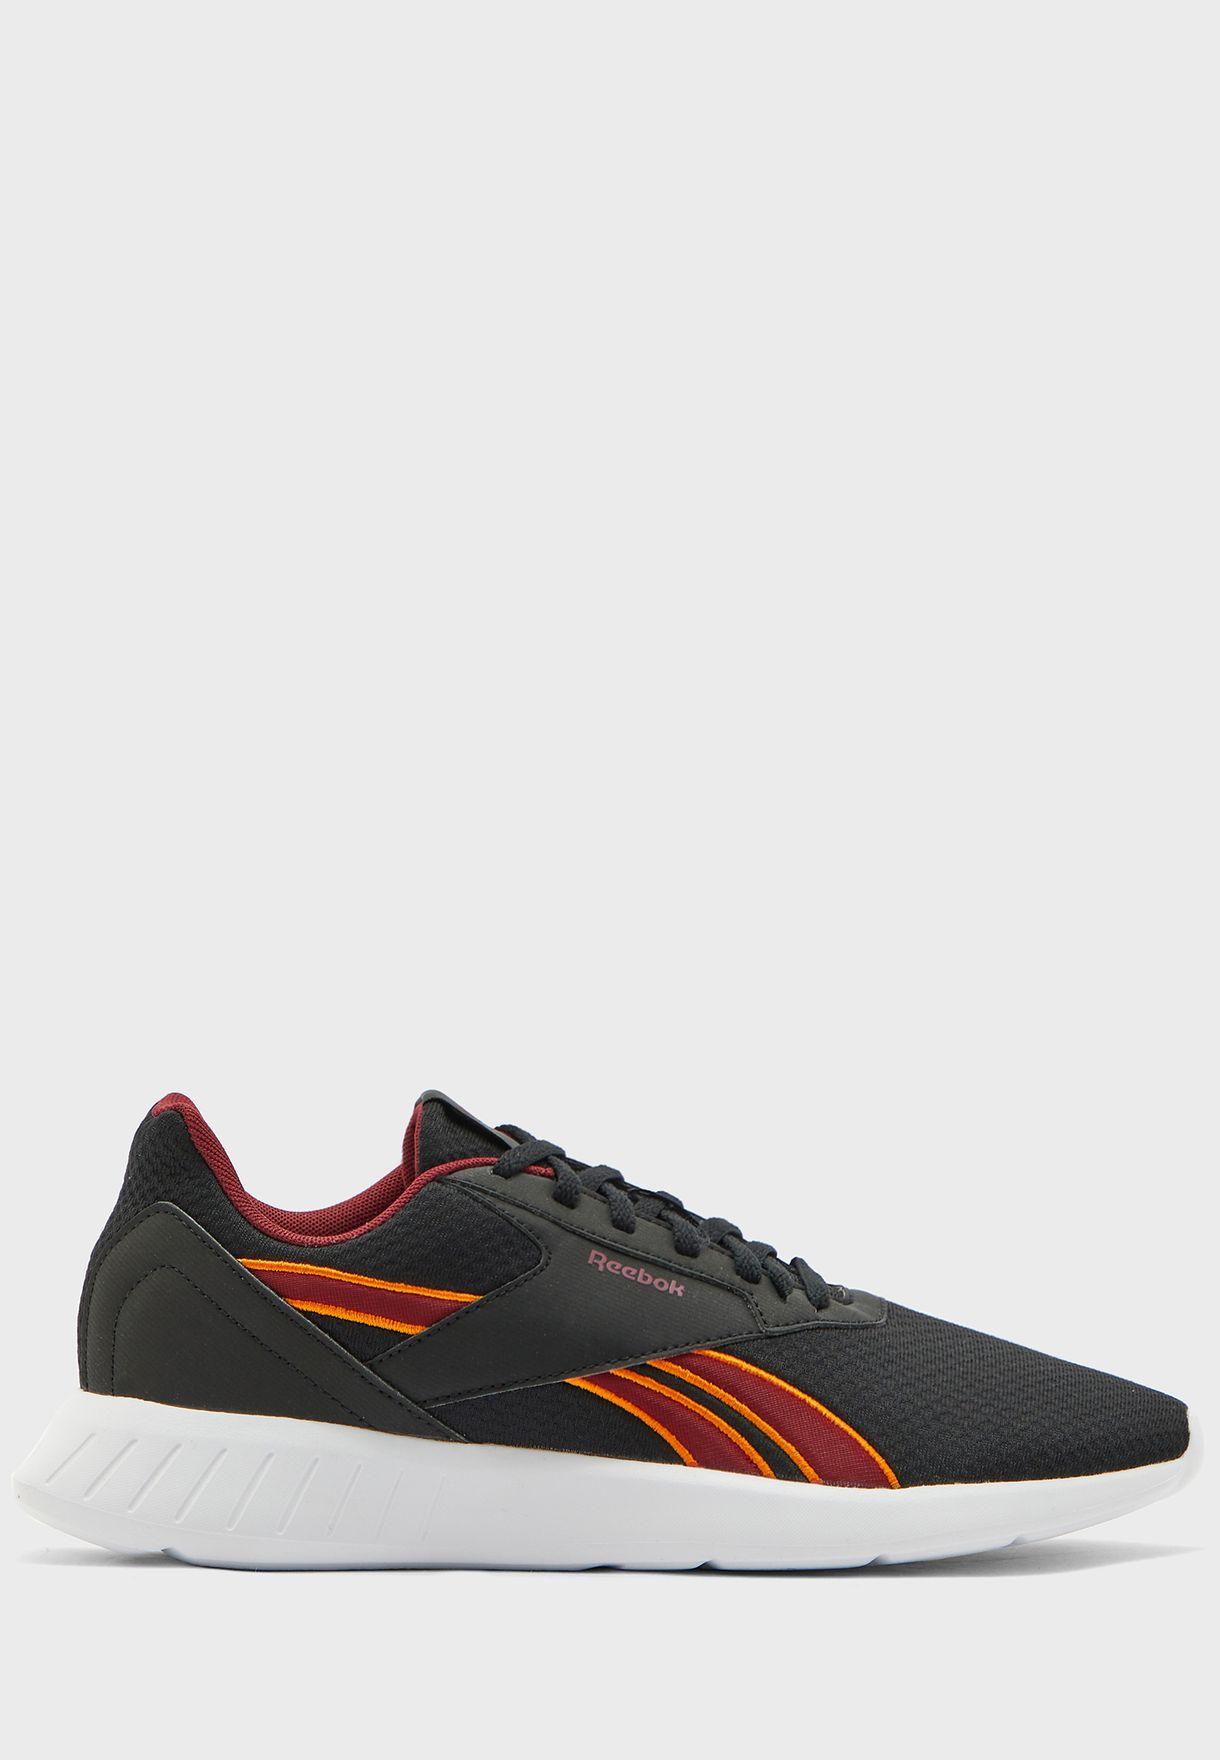 Lite 2.0 Men's Sports Running Shoes